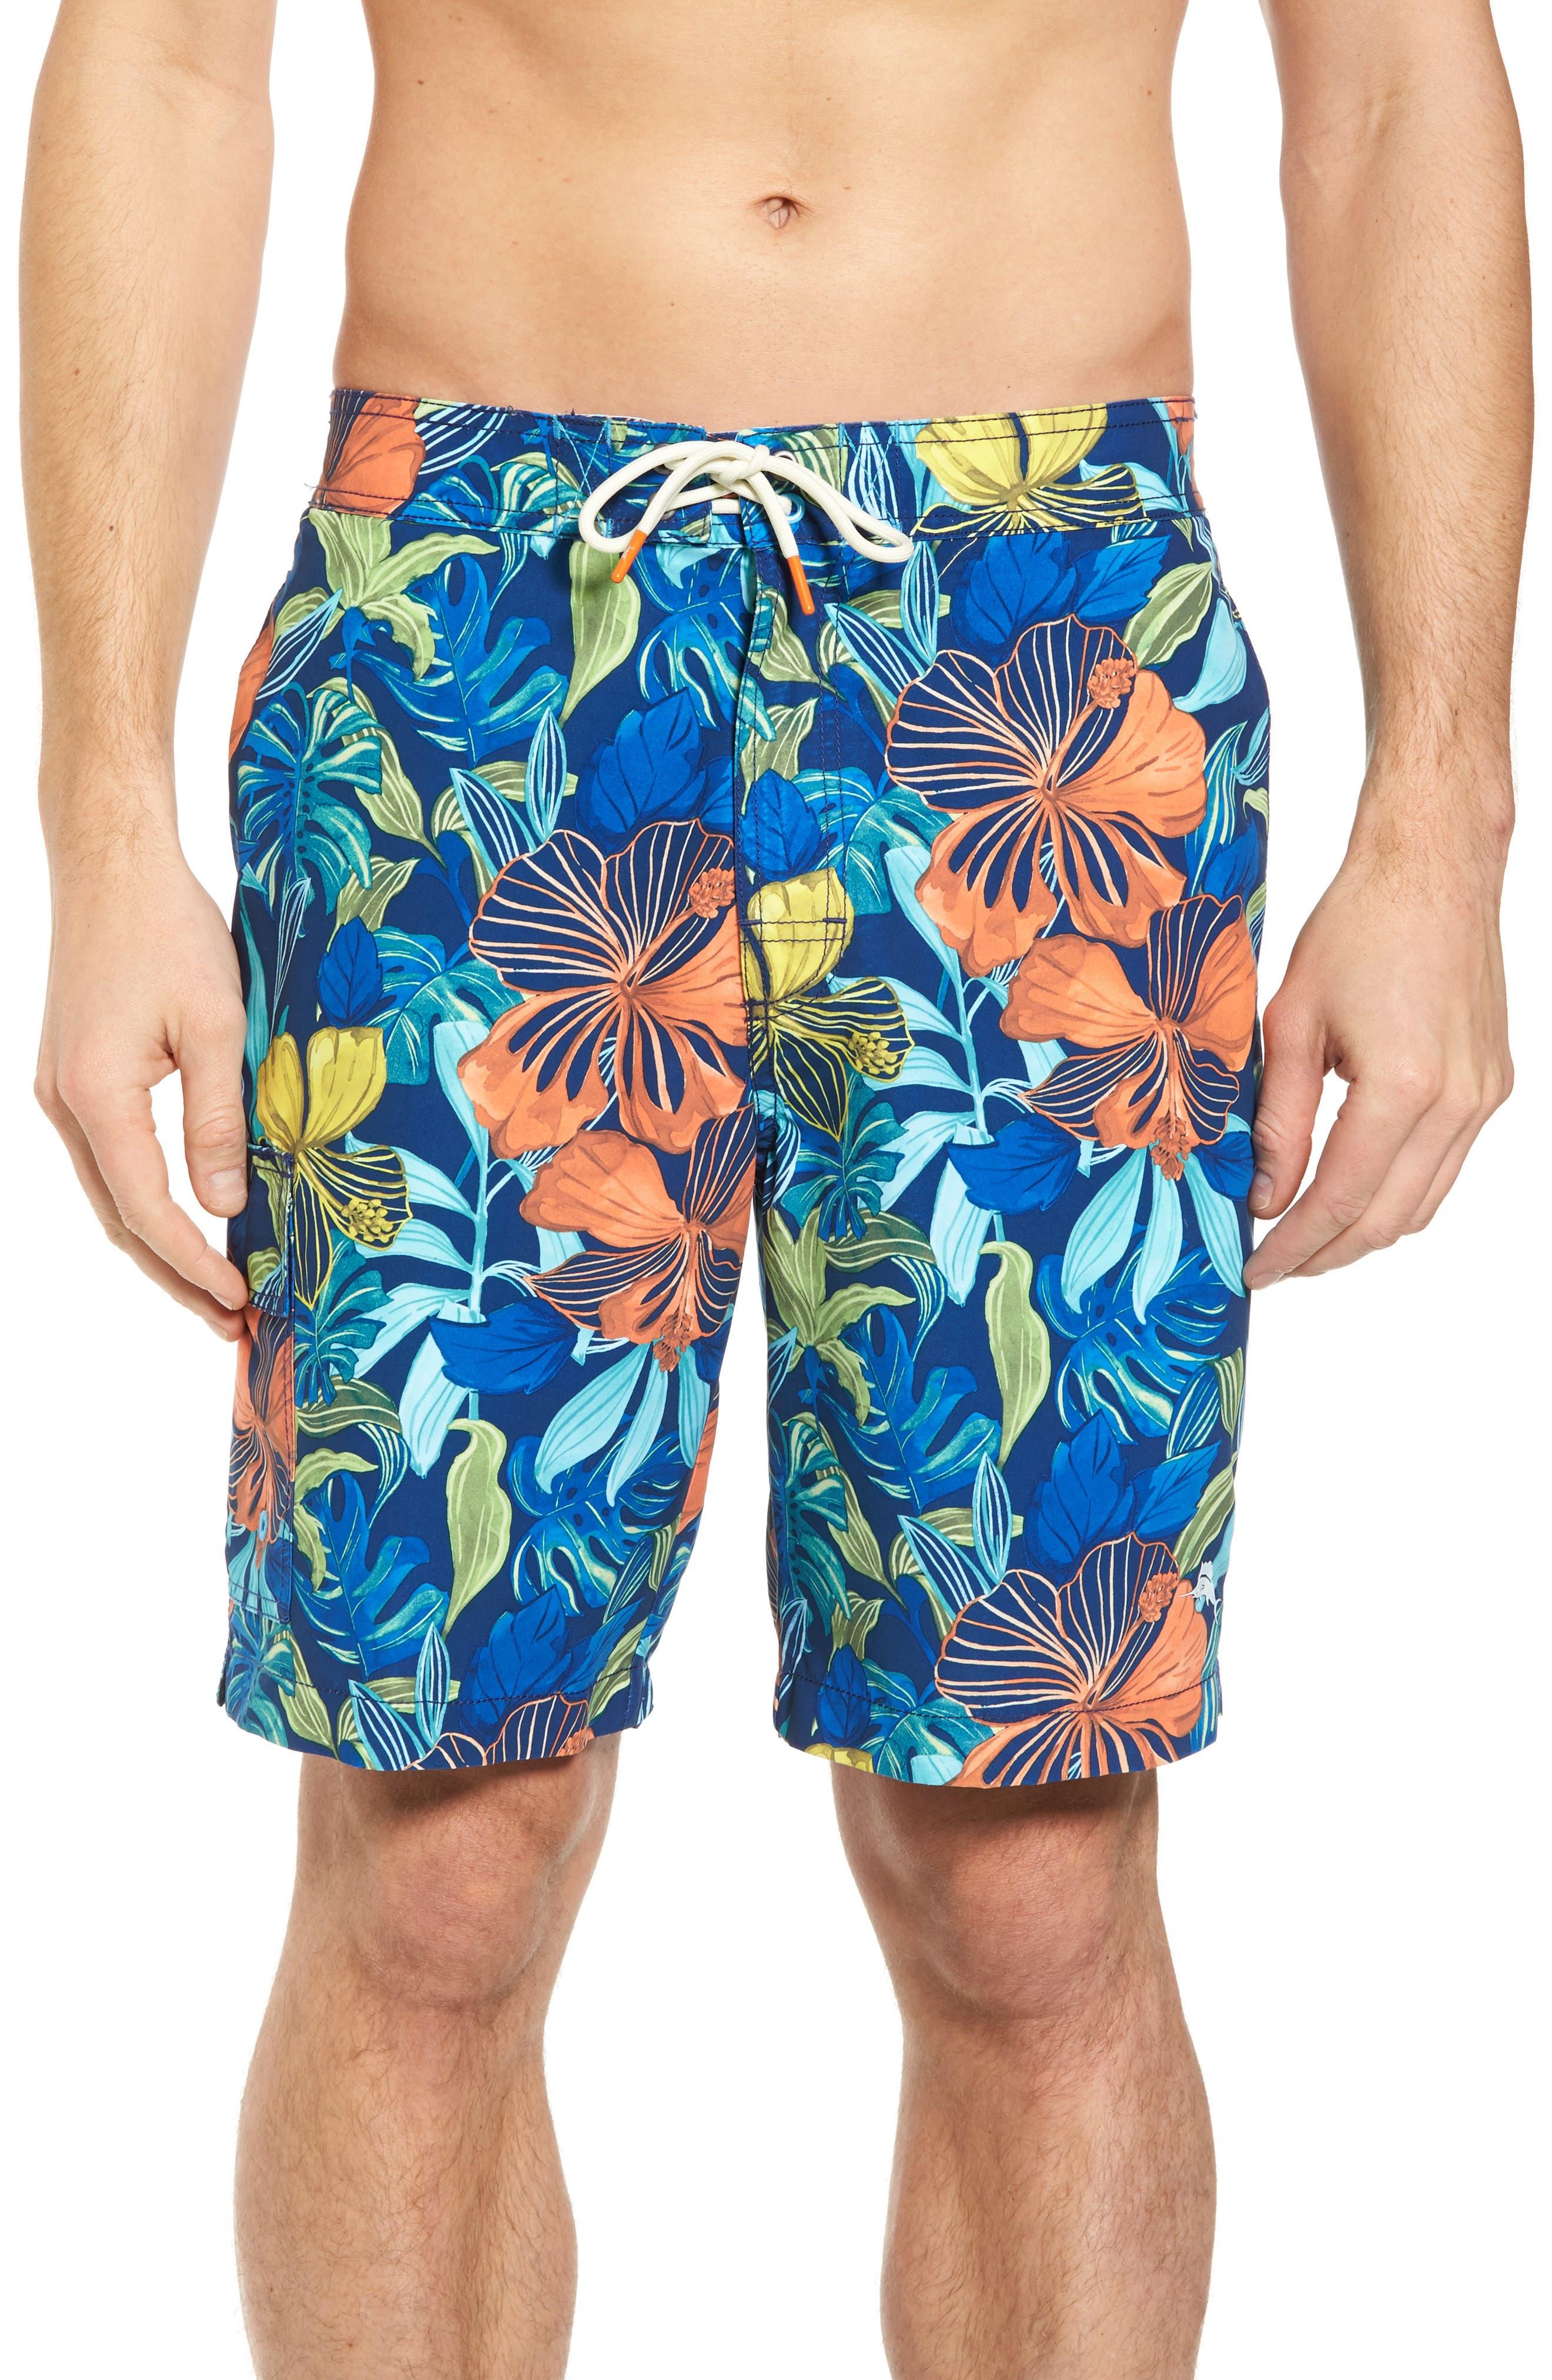 Baja Hibiscus Beach Swim Trunks,                             Main thumbnail 1, color,                             Kingdom Blue